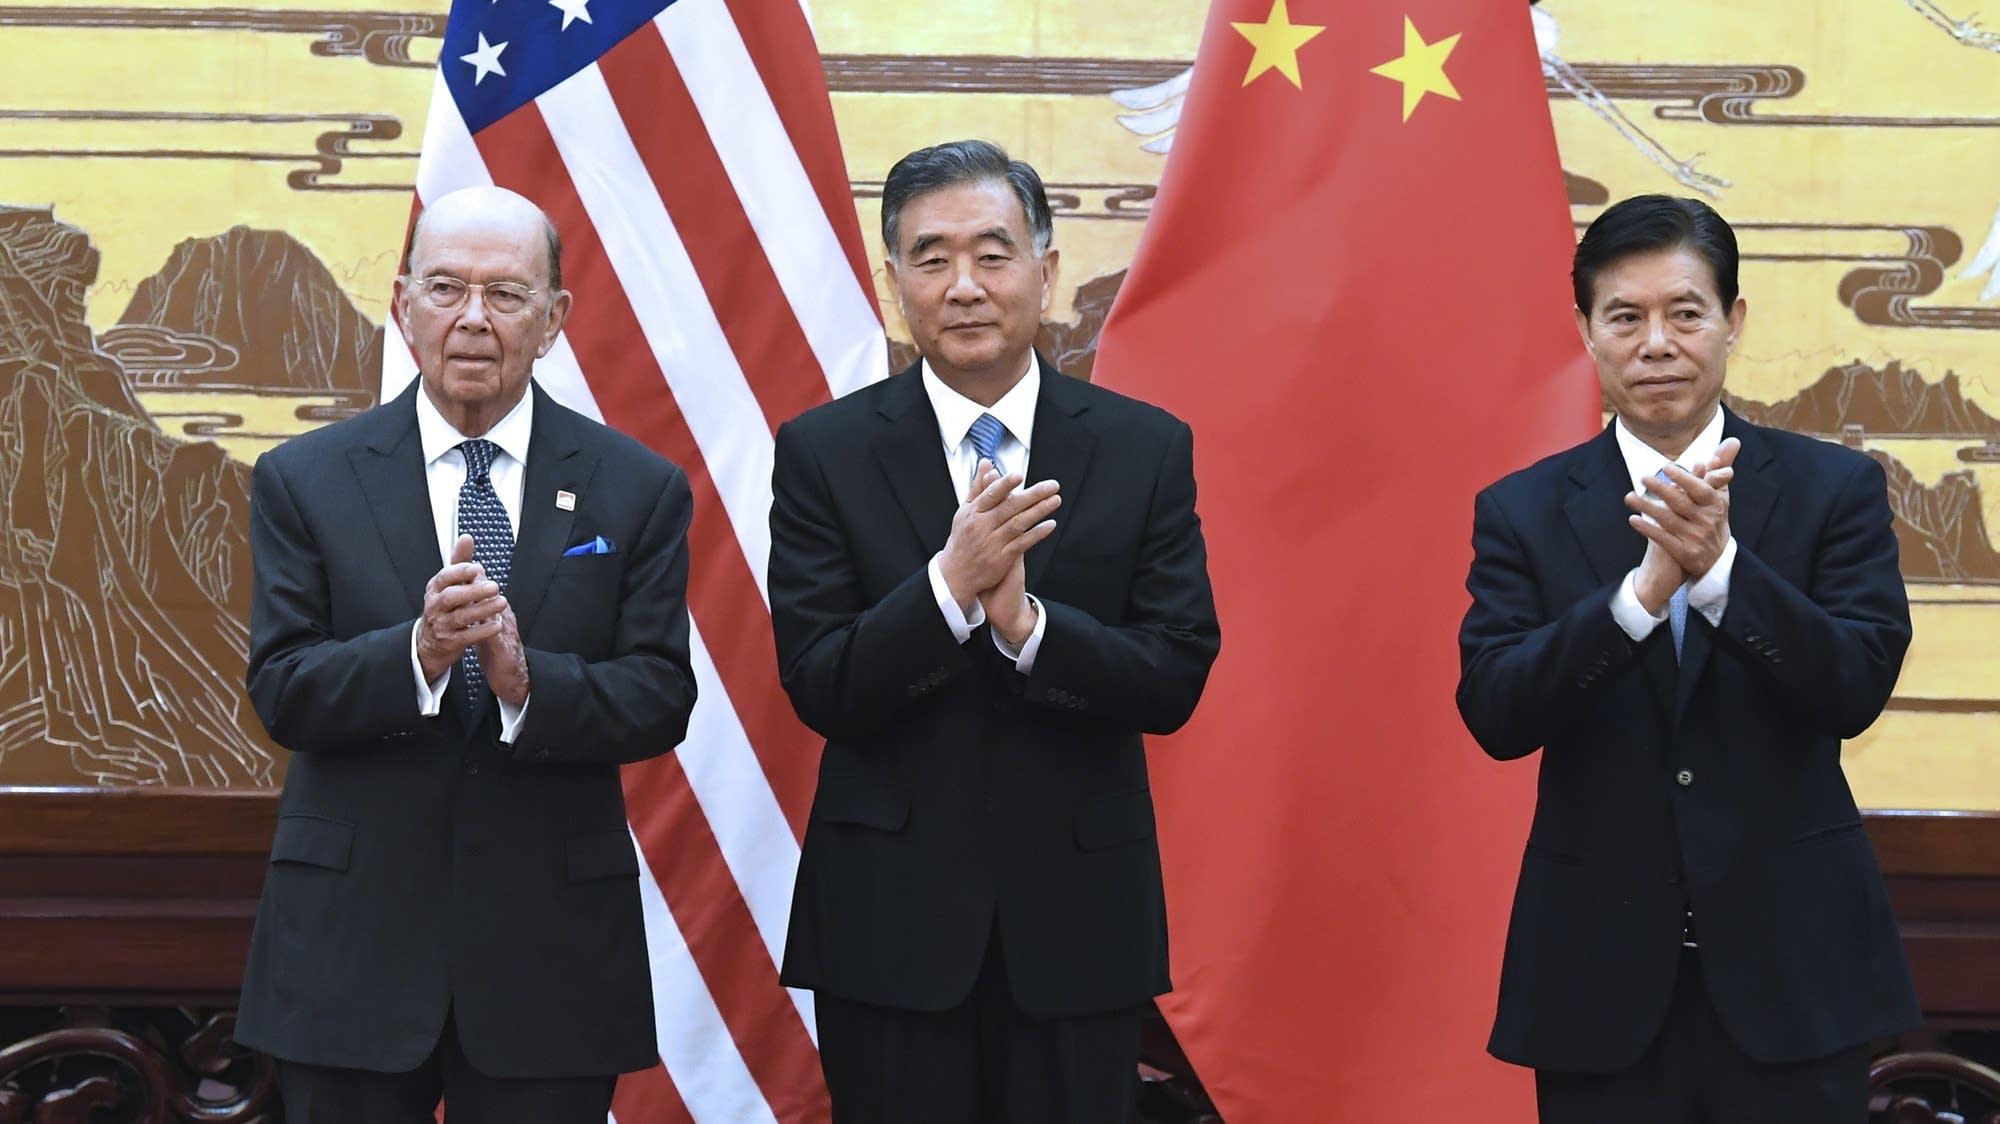 Wilbur Ross, Wang Yang, Zhong Shan